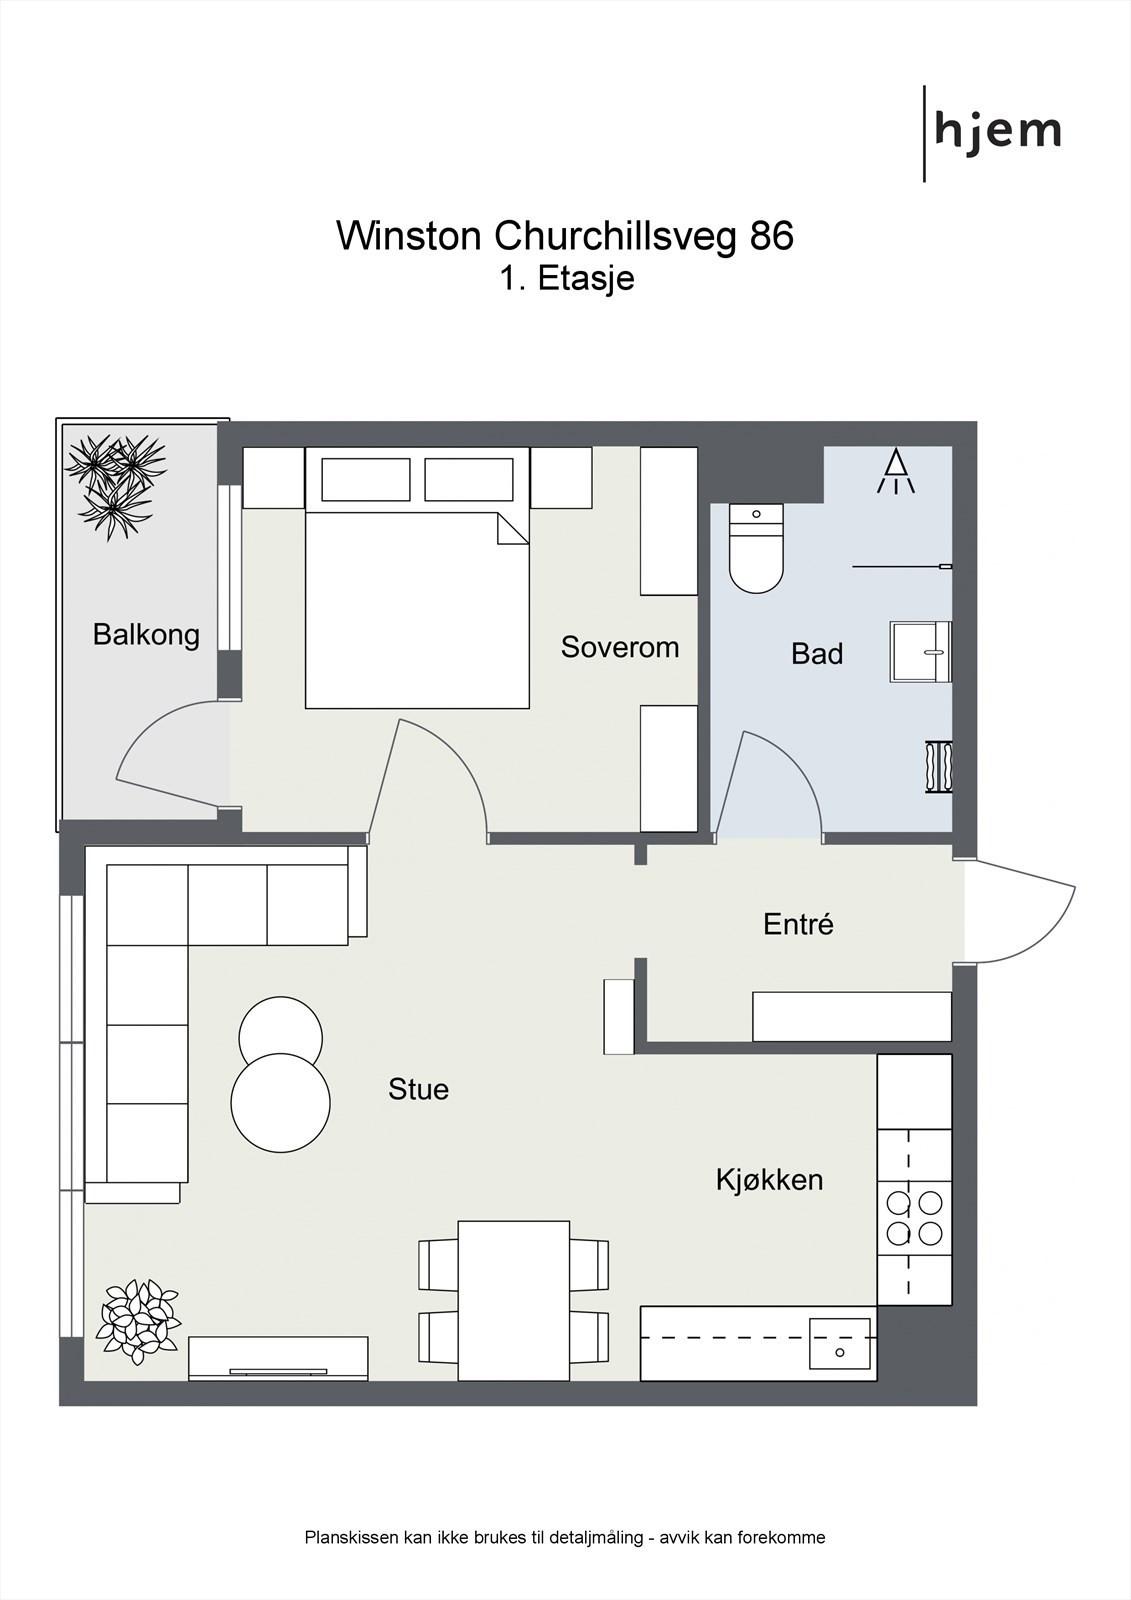 Floorplan letterhead - Winston Churchillsveg 86 - 1. Etasje - 2D Floor Plan.jpg